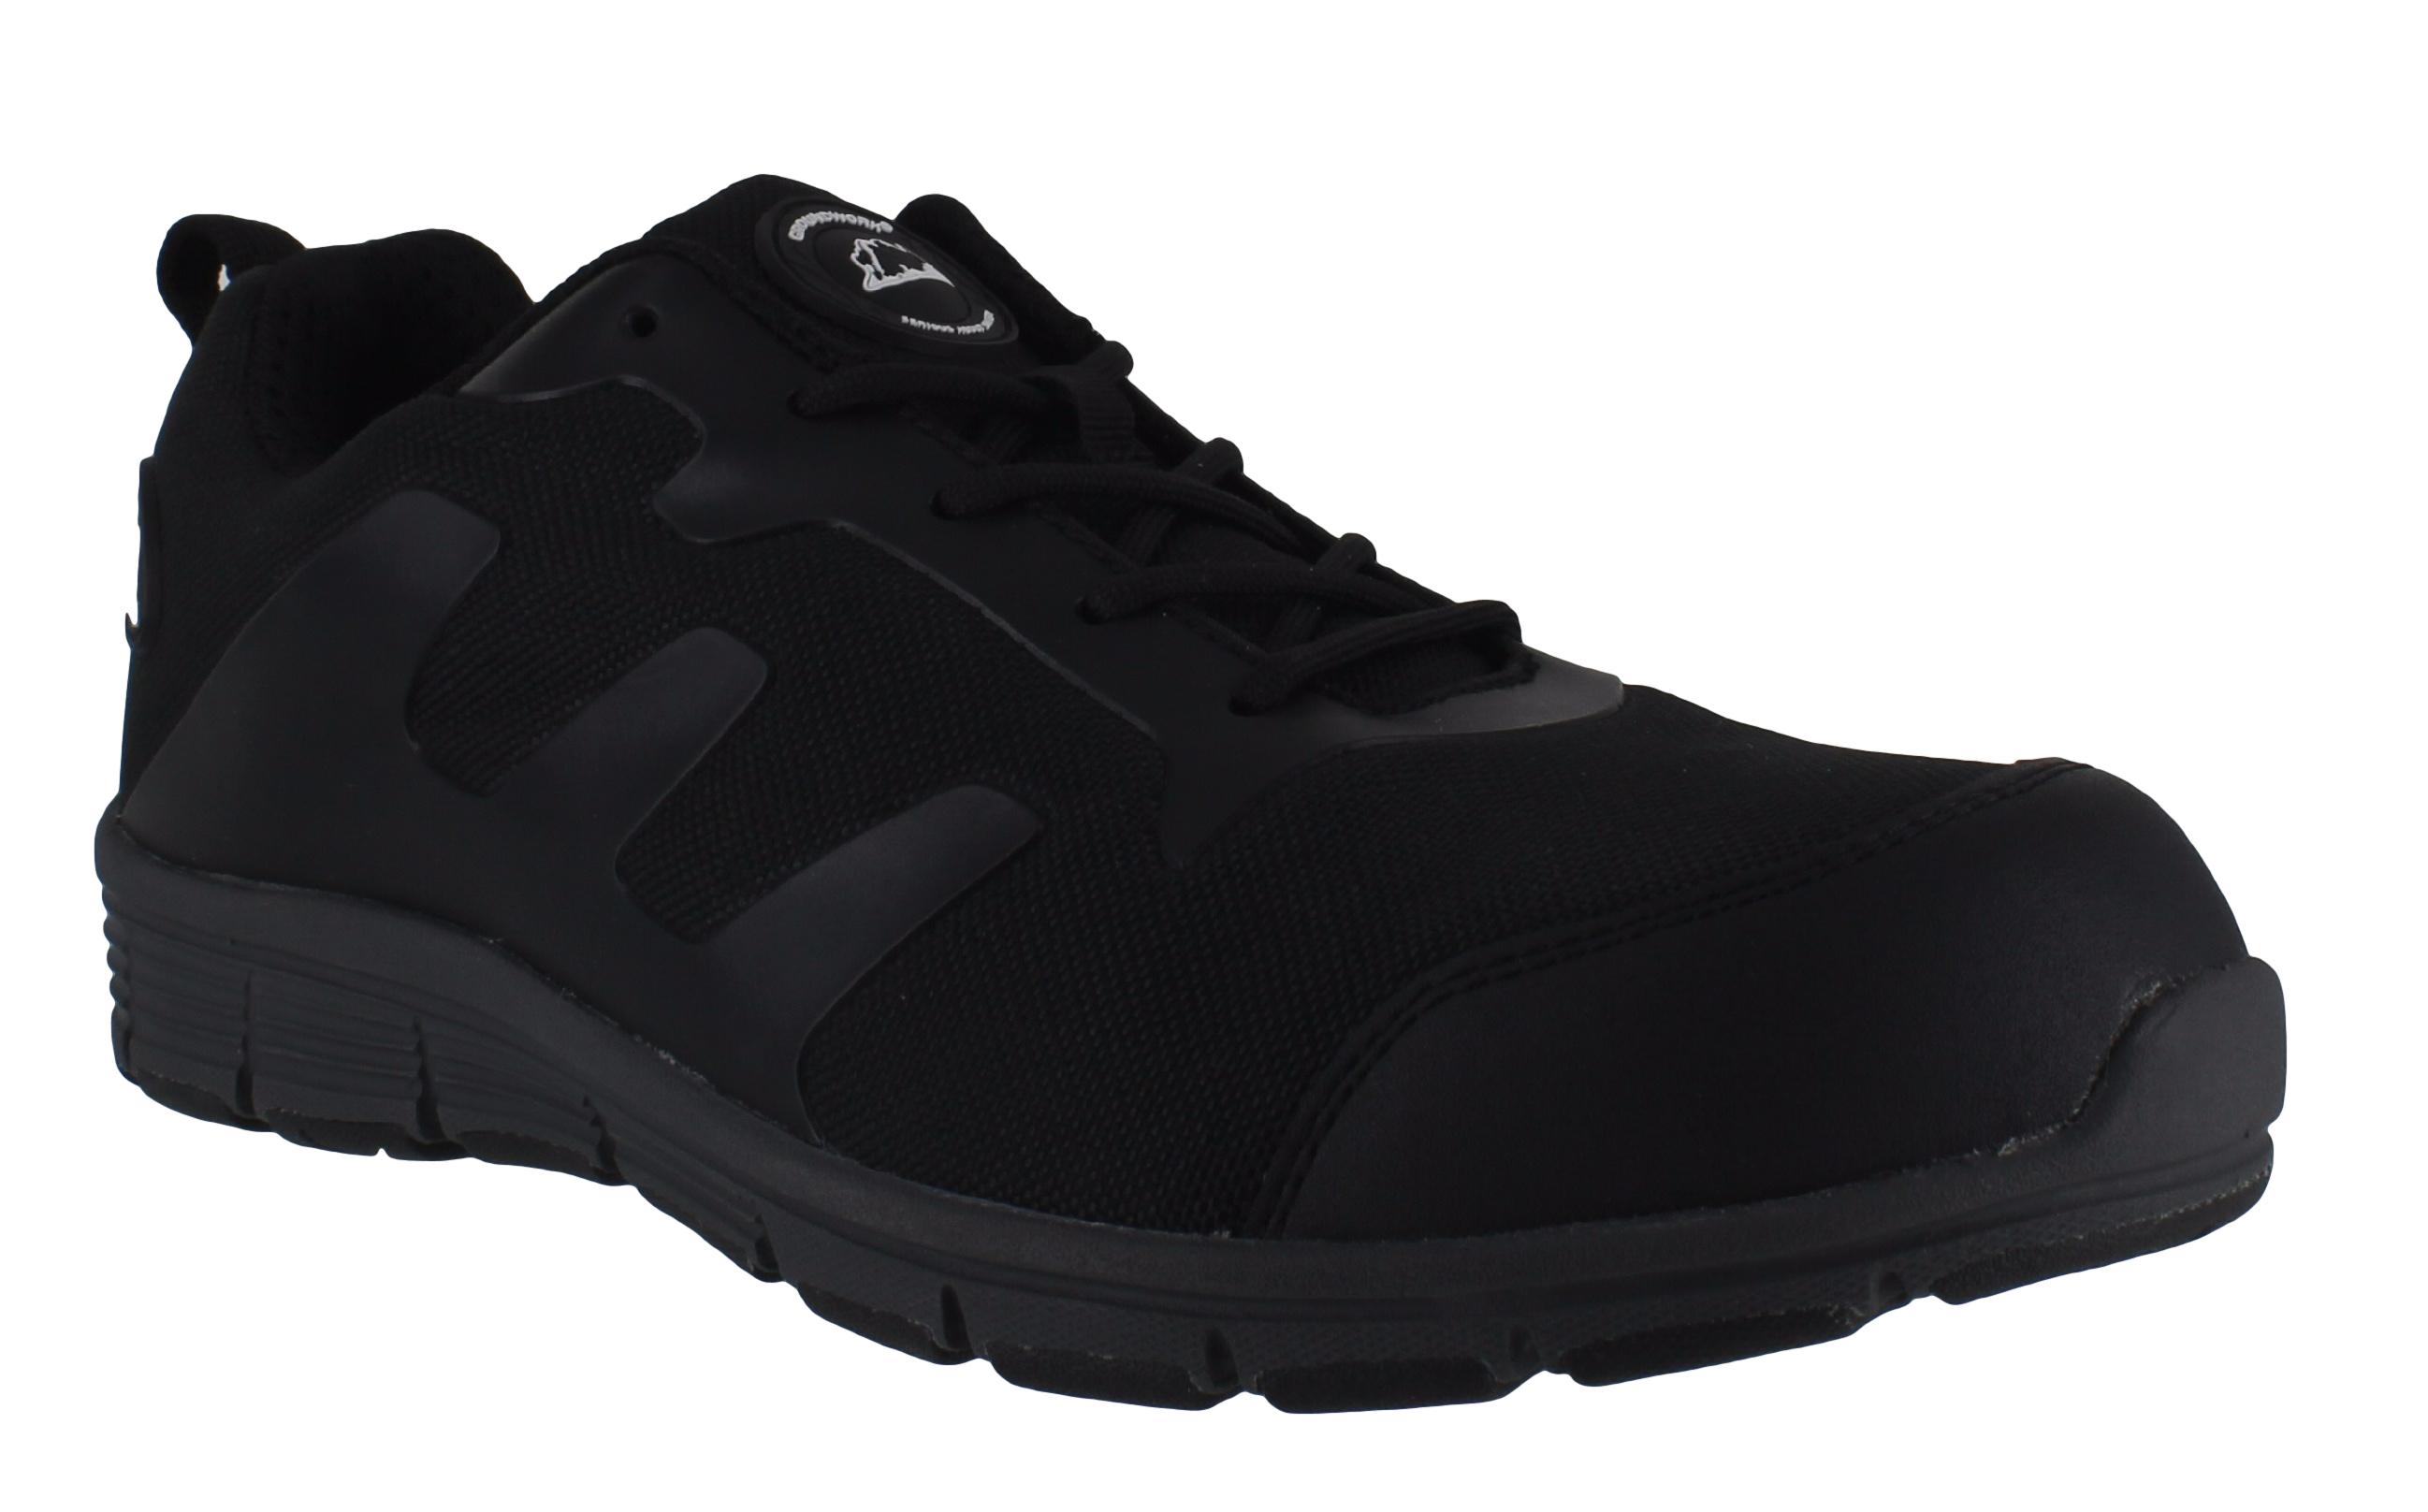 mens womens groundwork lightweight steel toe safety shoes. Black Bedroom Furniture Sets. Home Design Ideas